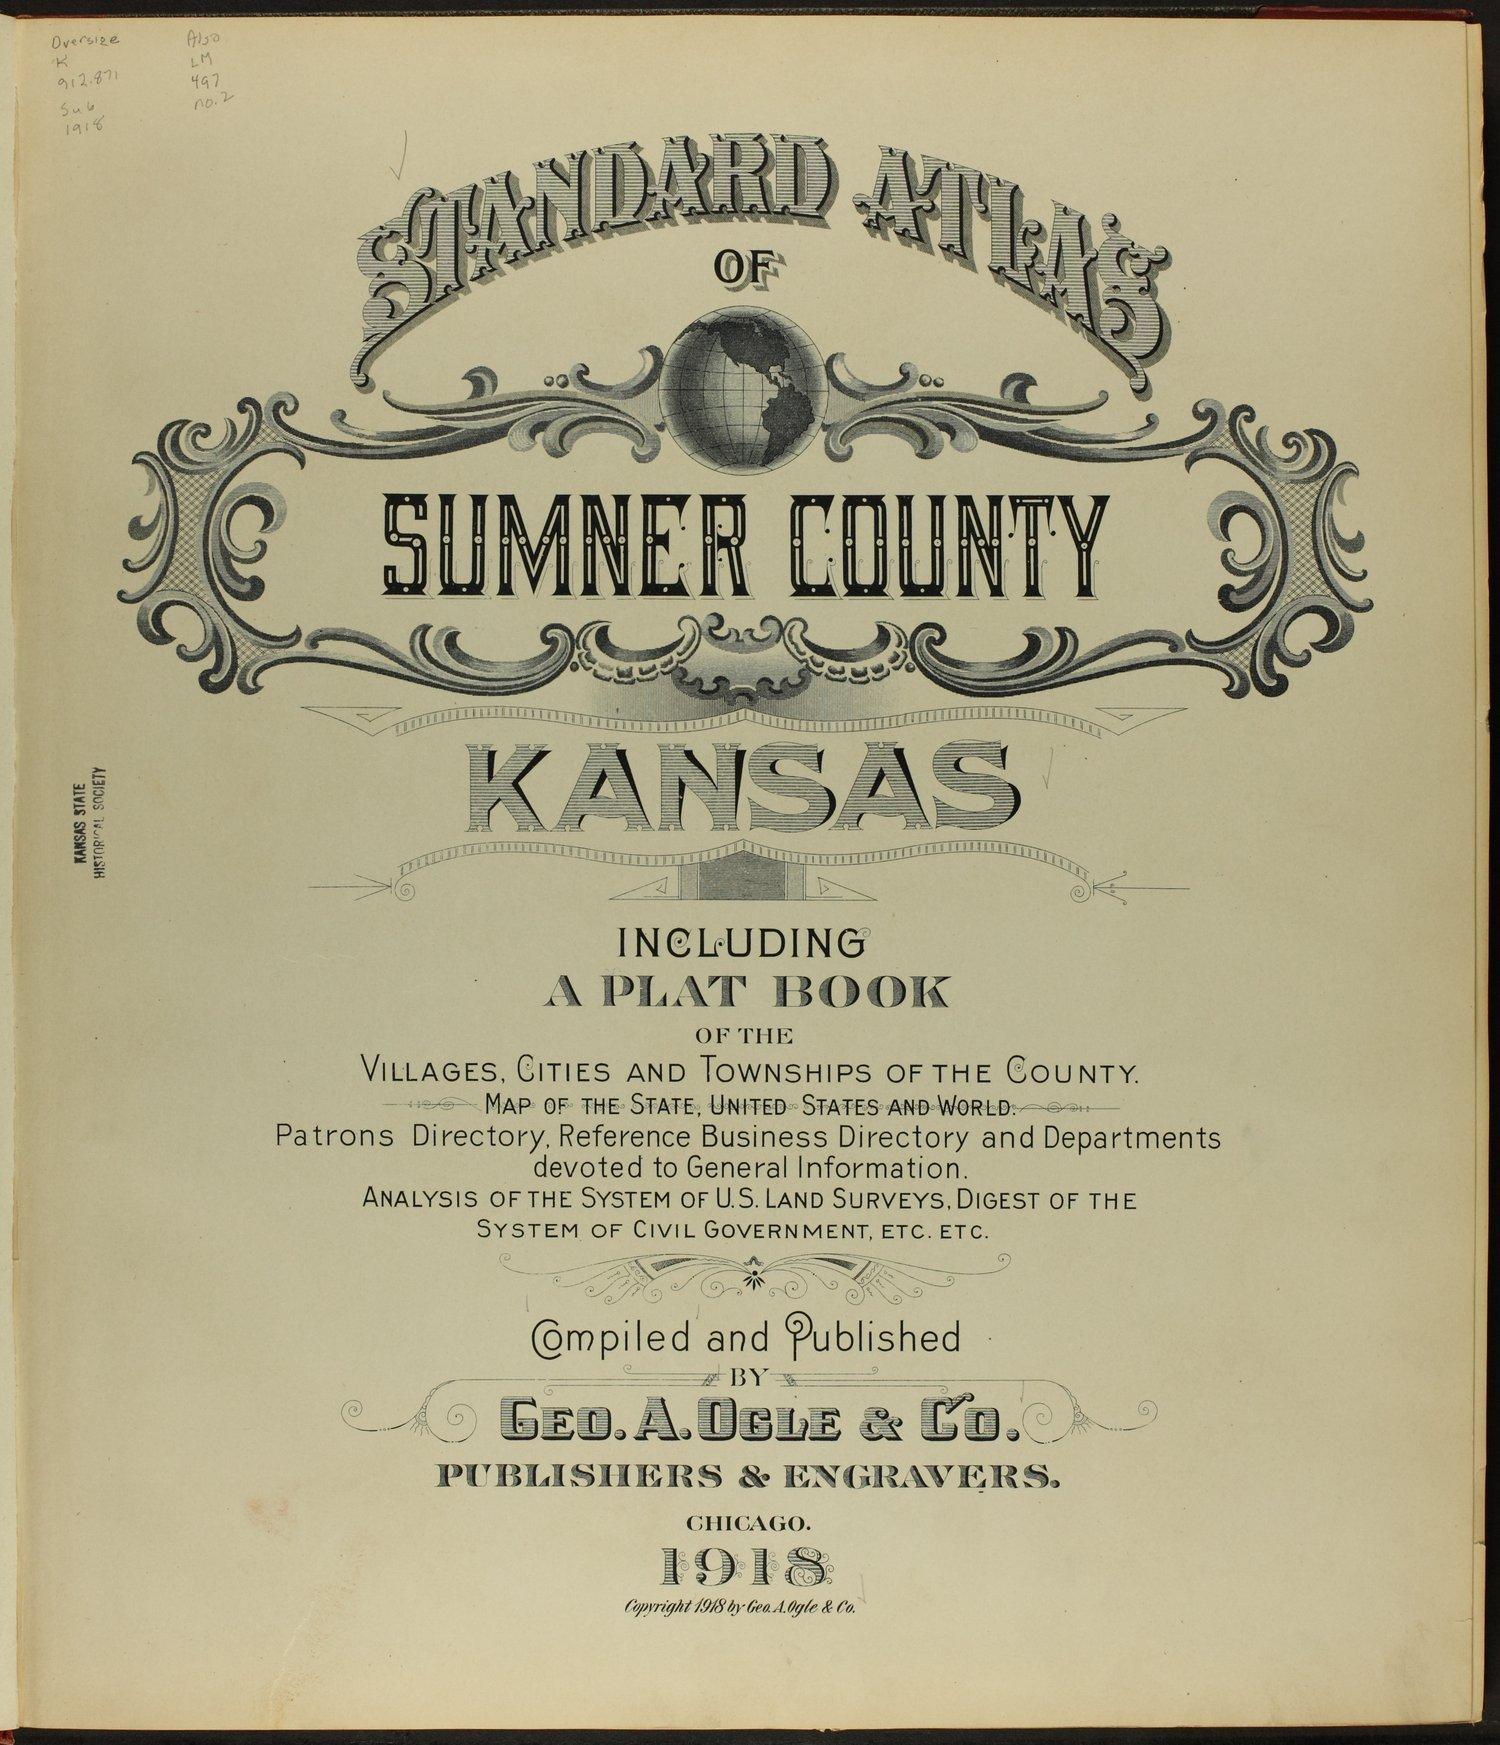 Standard atlas of Sumner County, Kansas - Title Page